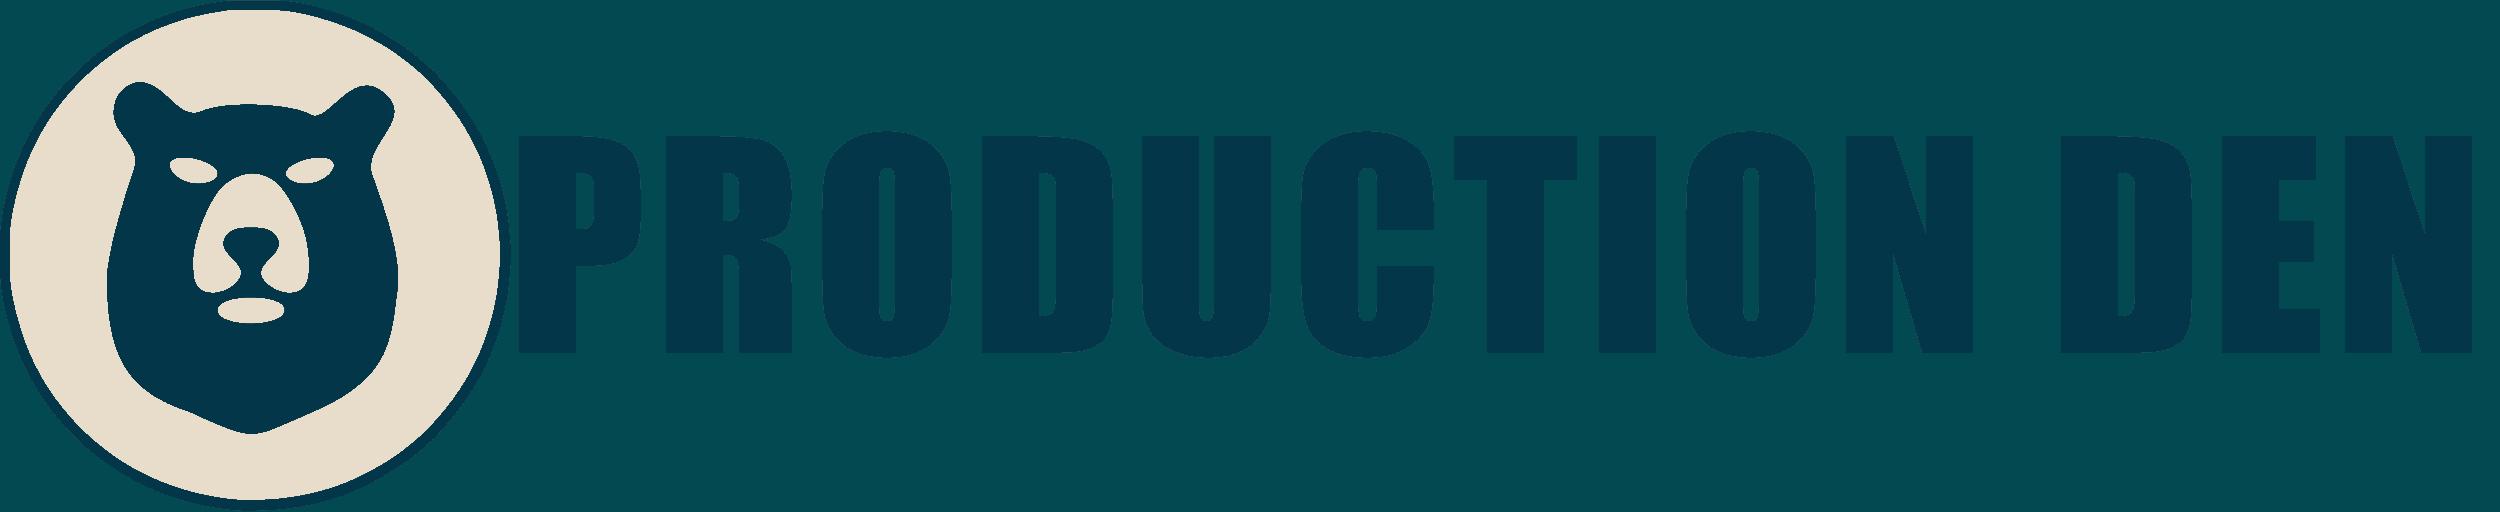 Audio Interface Outputs Explained - Production Den